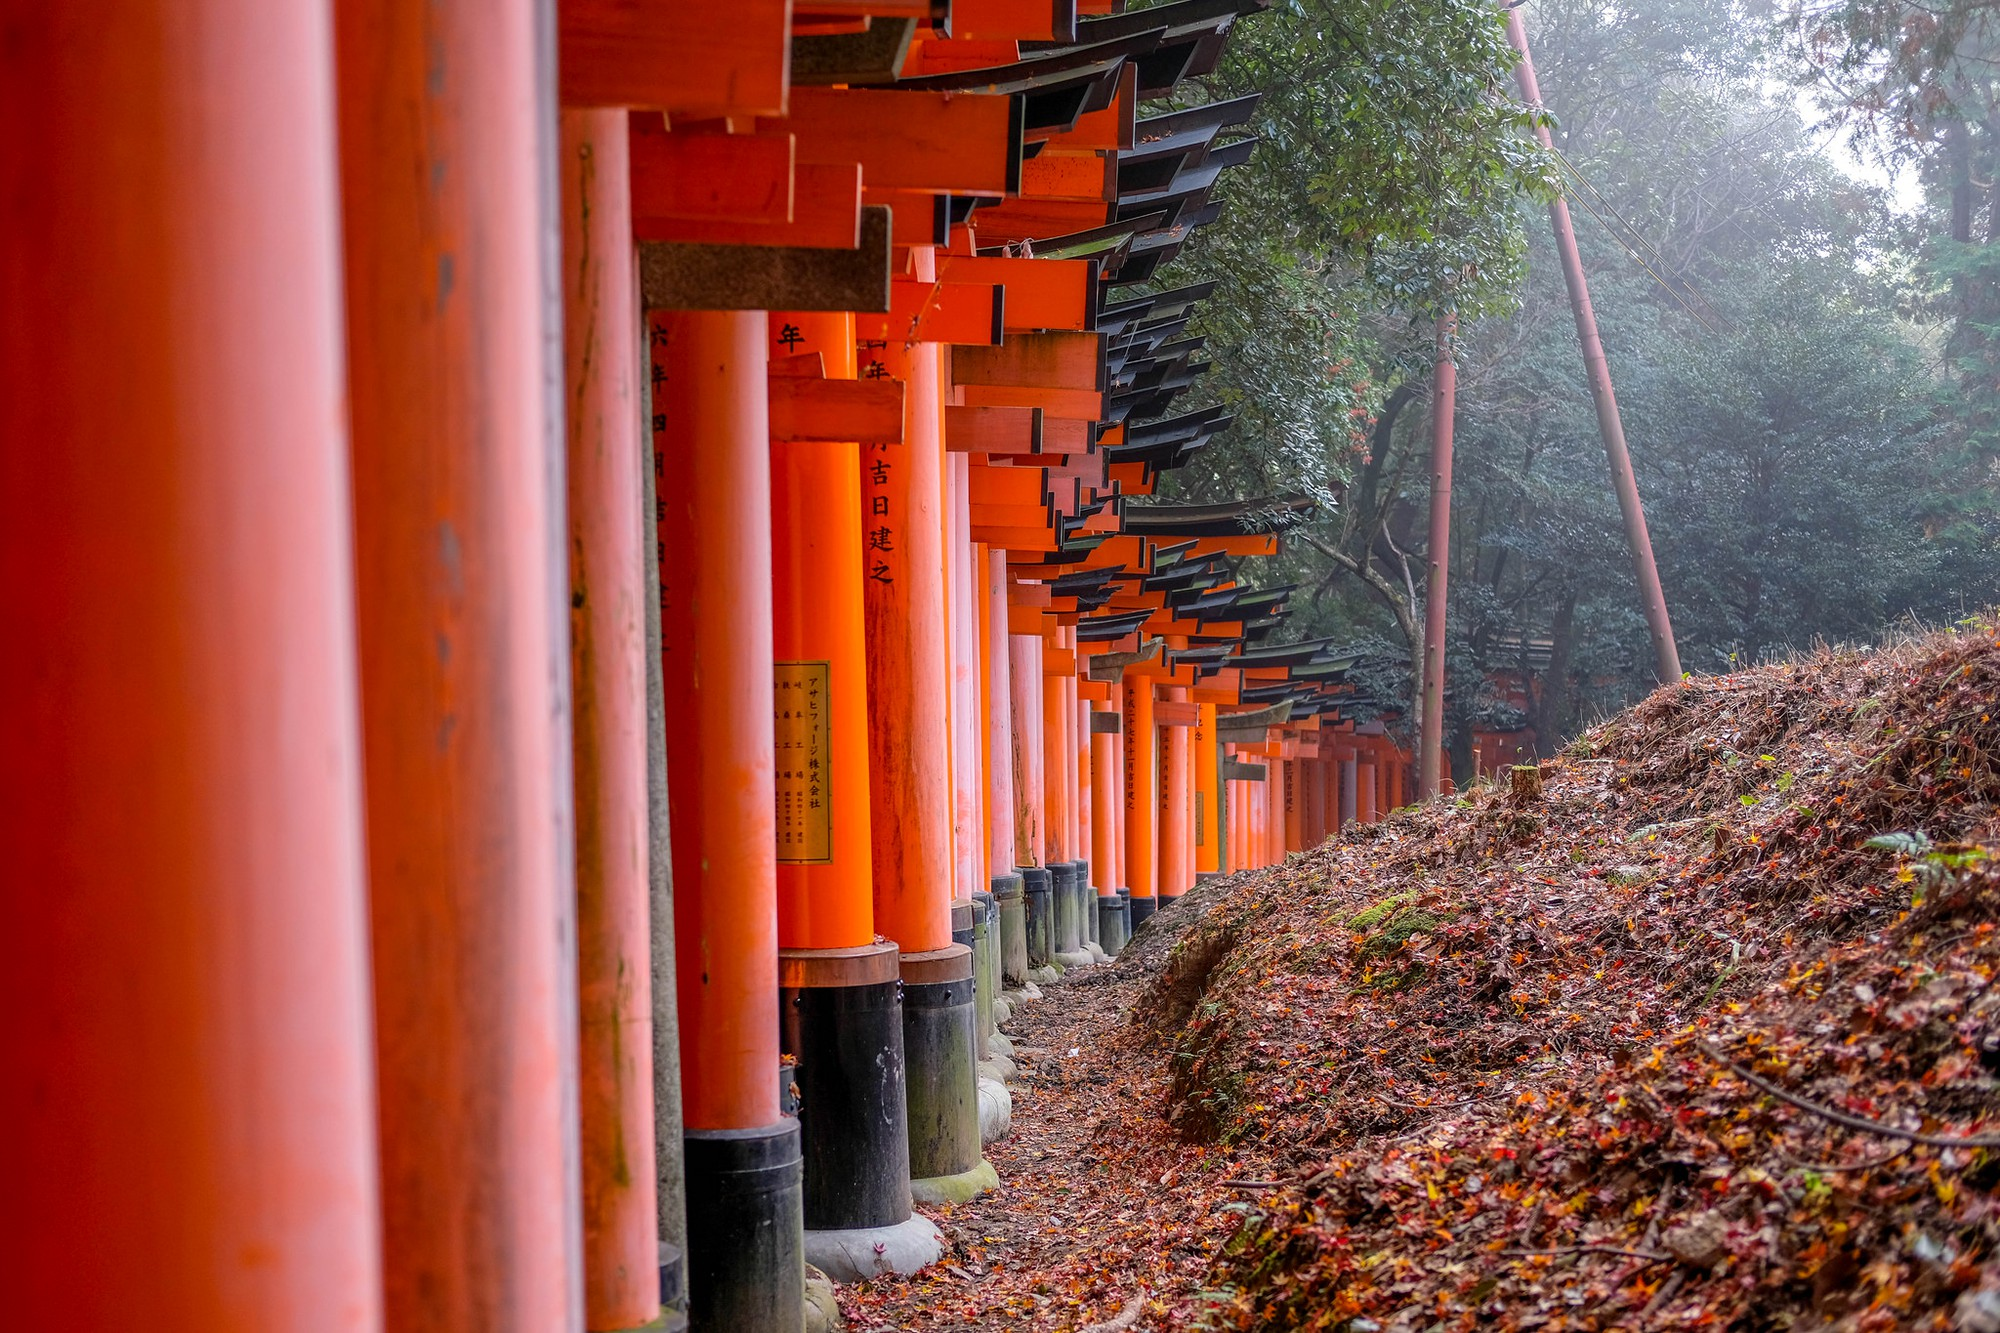 Torii Gates at Fushimi Inari Shrine. Credit: sergejf. Licensed under CC 2.0.